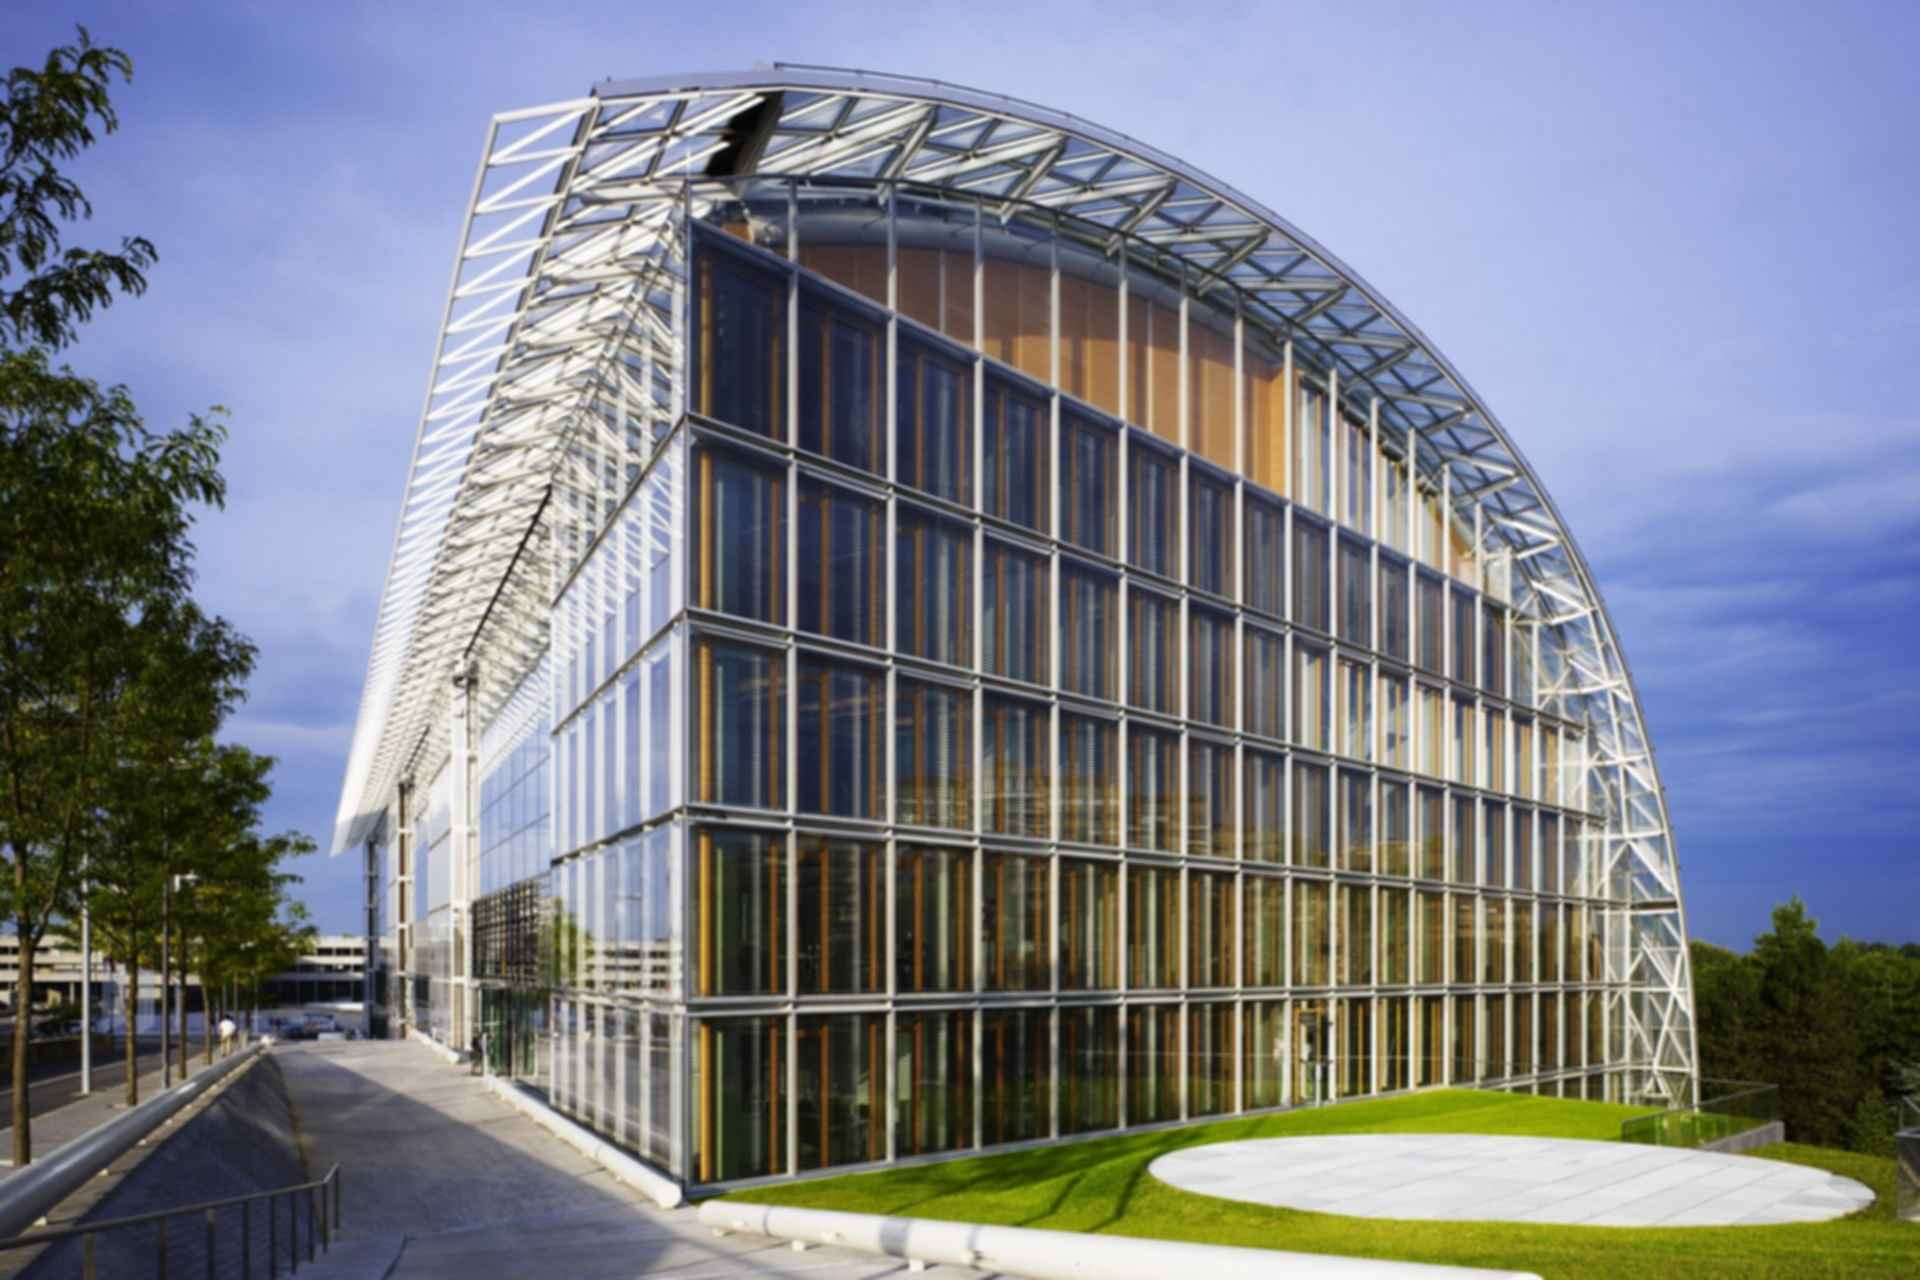 European Investment Bank - Exterior/Path